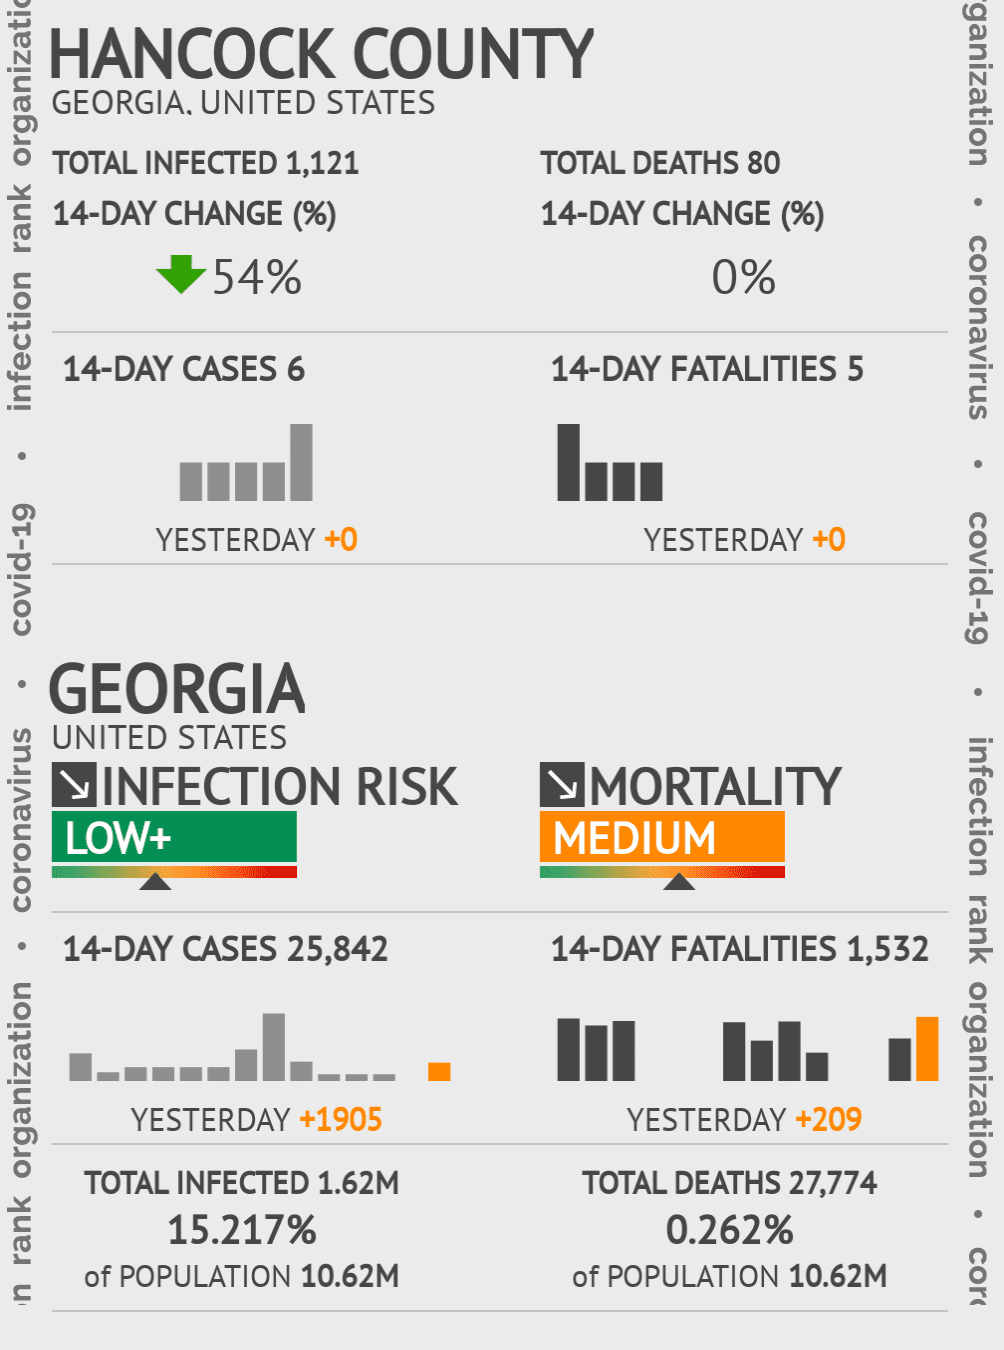 Hancock County Coronavirus Covid-19 Risk of Infection on March 23, 2021